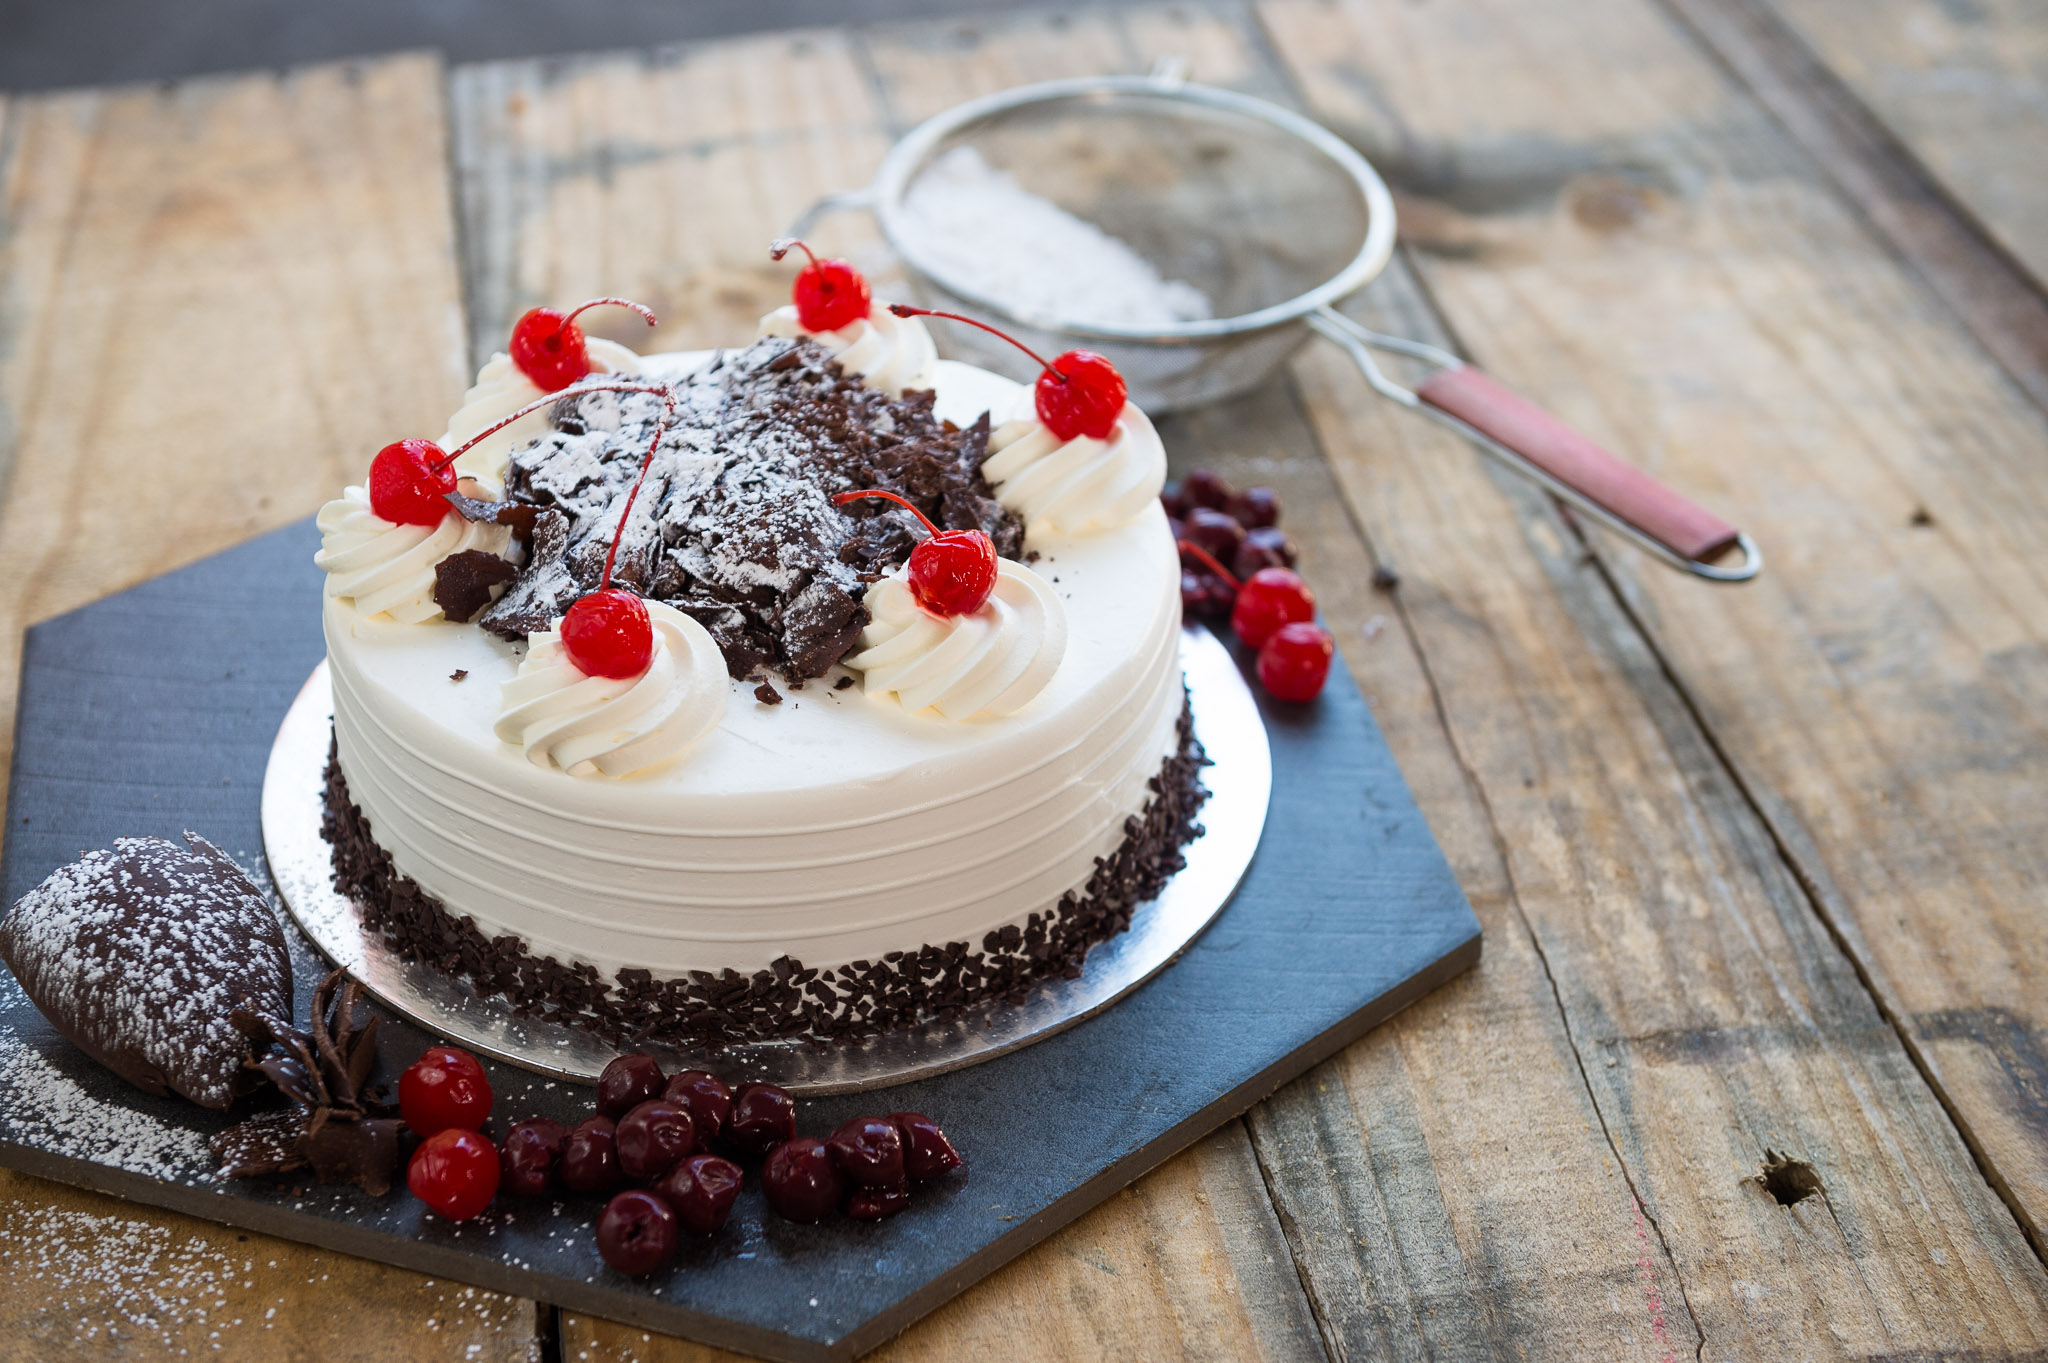 Chocolate and Jam Torte